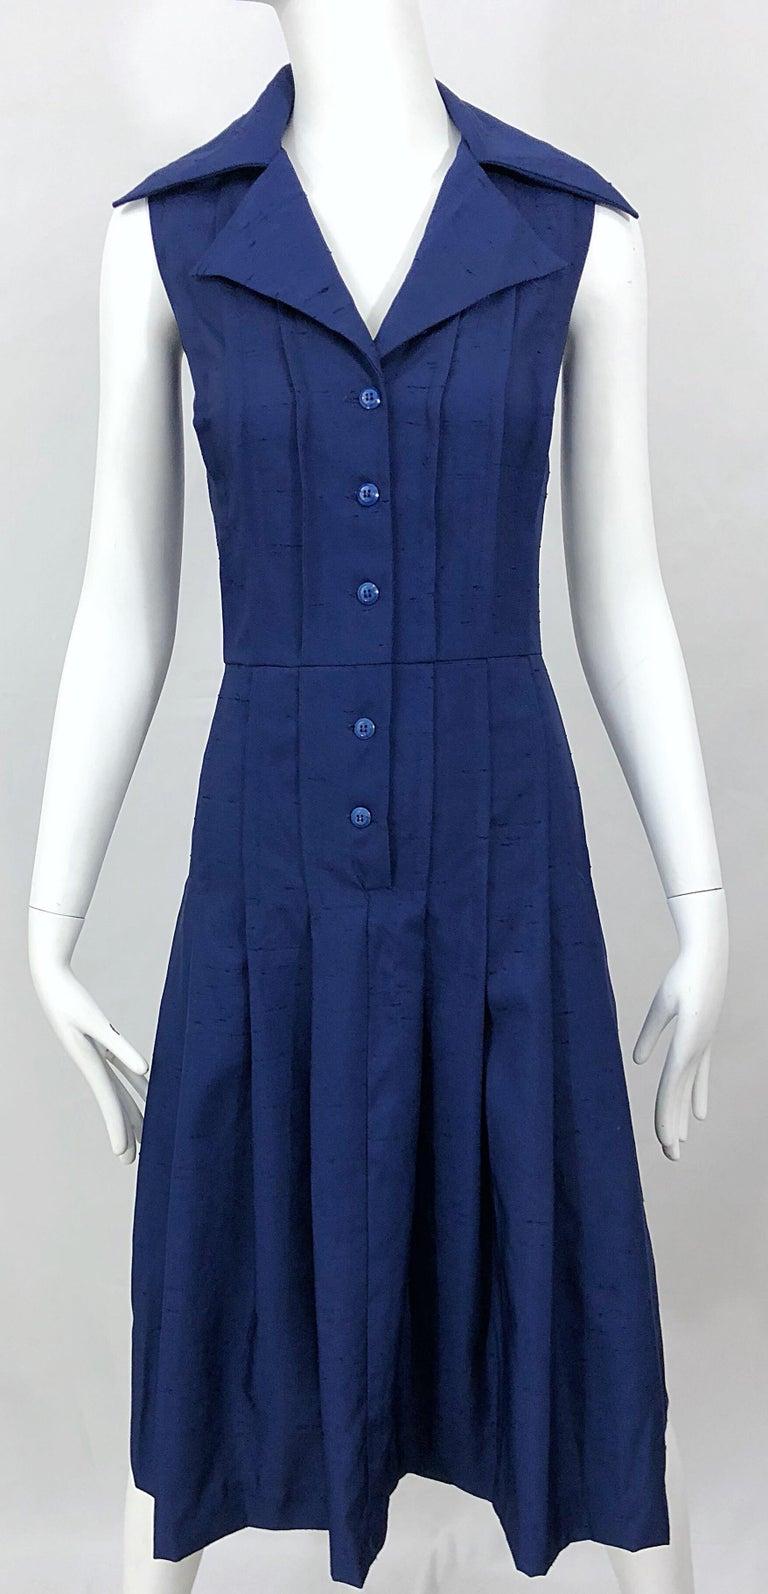 1990s Saks 5th Avenue Size 10 Navy Blue Silk Vintage 90s Sleeveless Shirt Dress For Sale 5